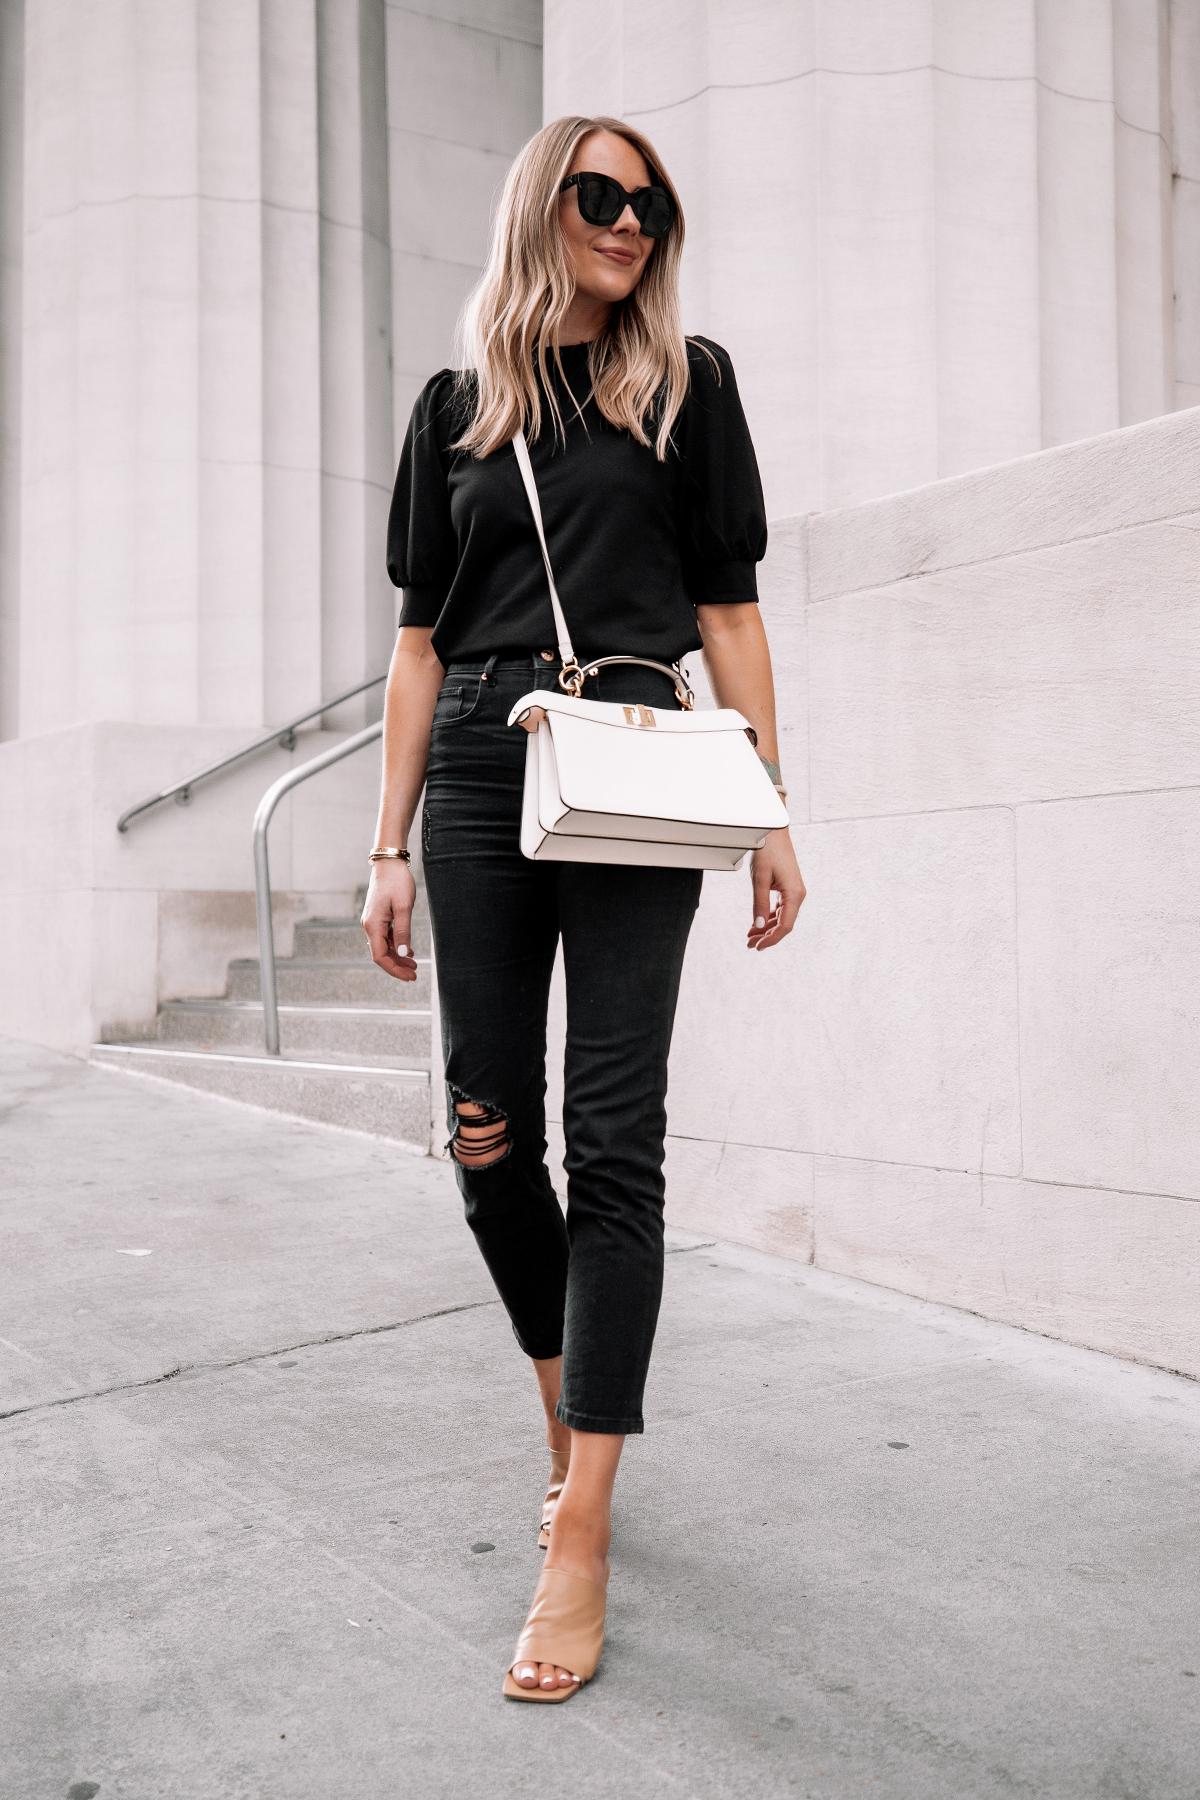 Fashion Jackson Wearing Black Top Black Ripped Jeans Nude Heeld Sandals Fendi White Peekaboo Handbag Street Style